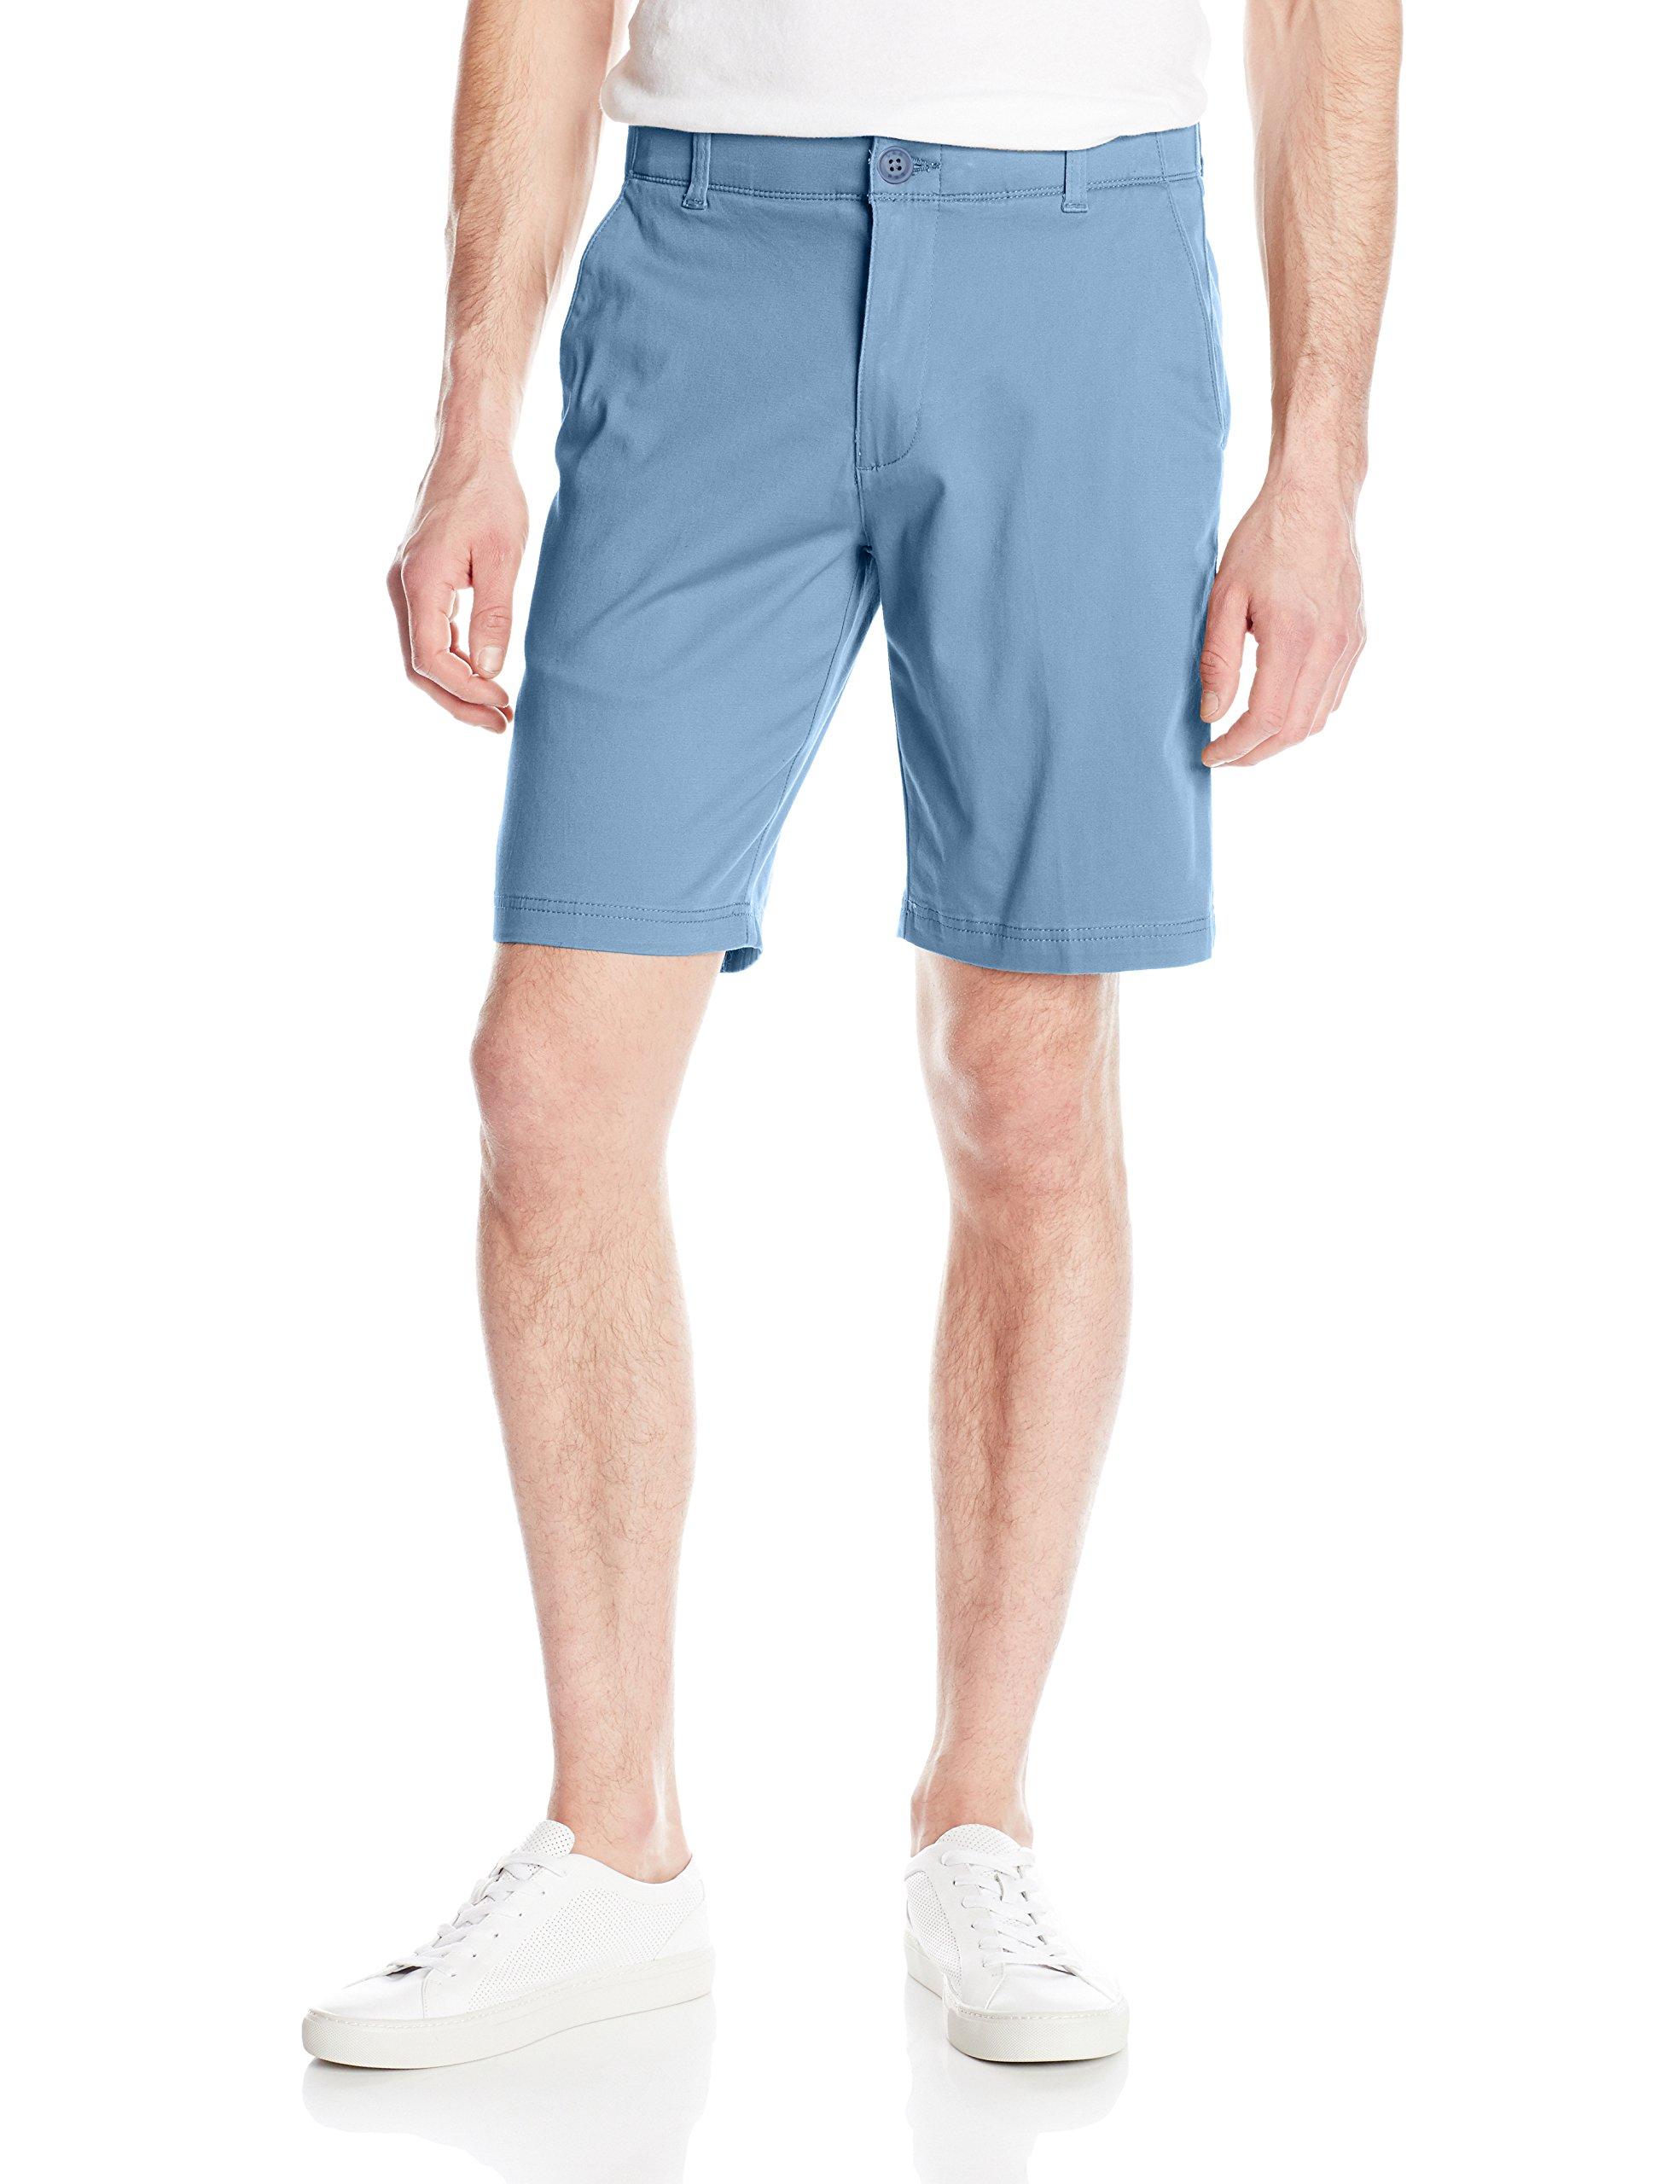 LEE Men's Big-Tall Performance Series Extreme Comfort Short, Coronet Blue, 46